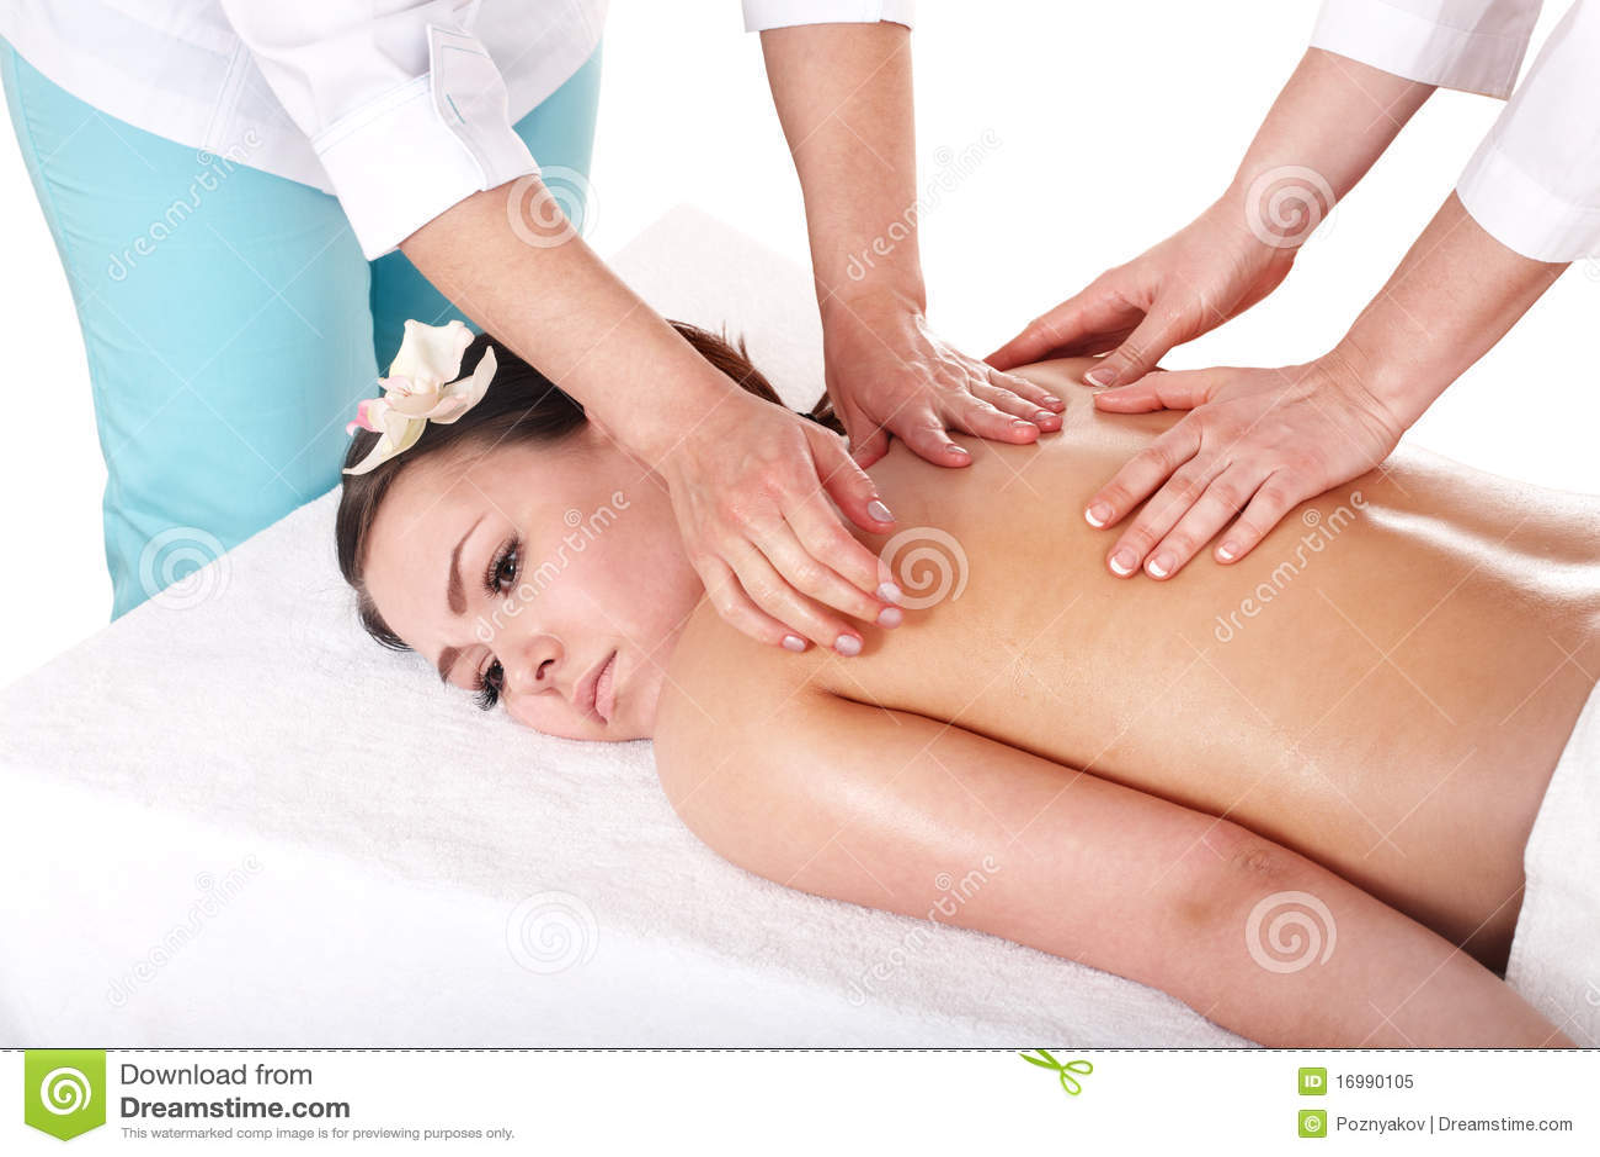 lesben-massage